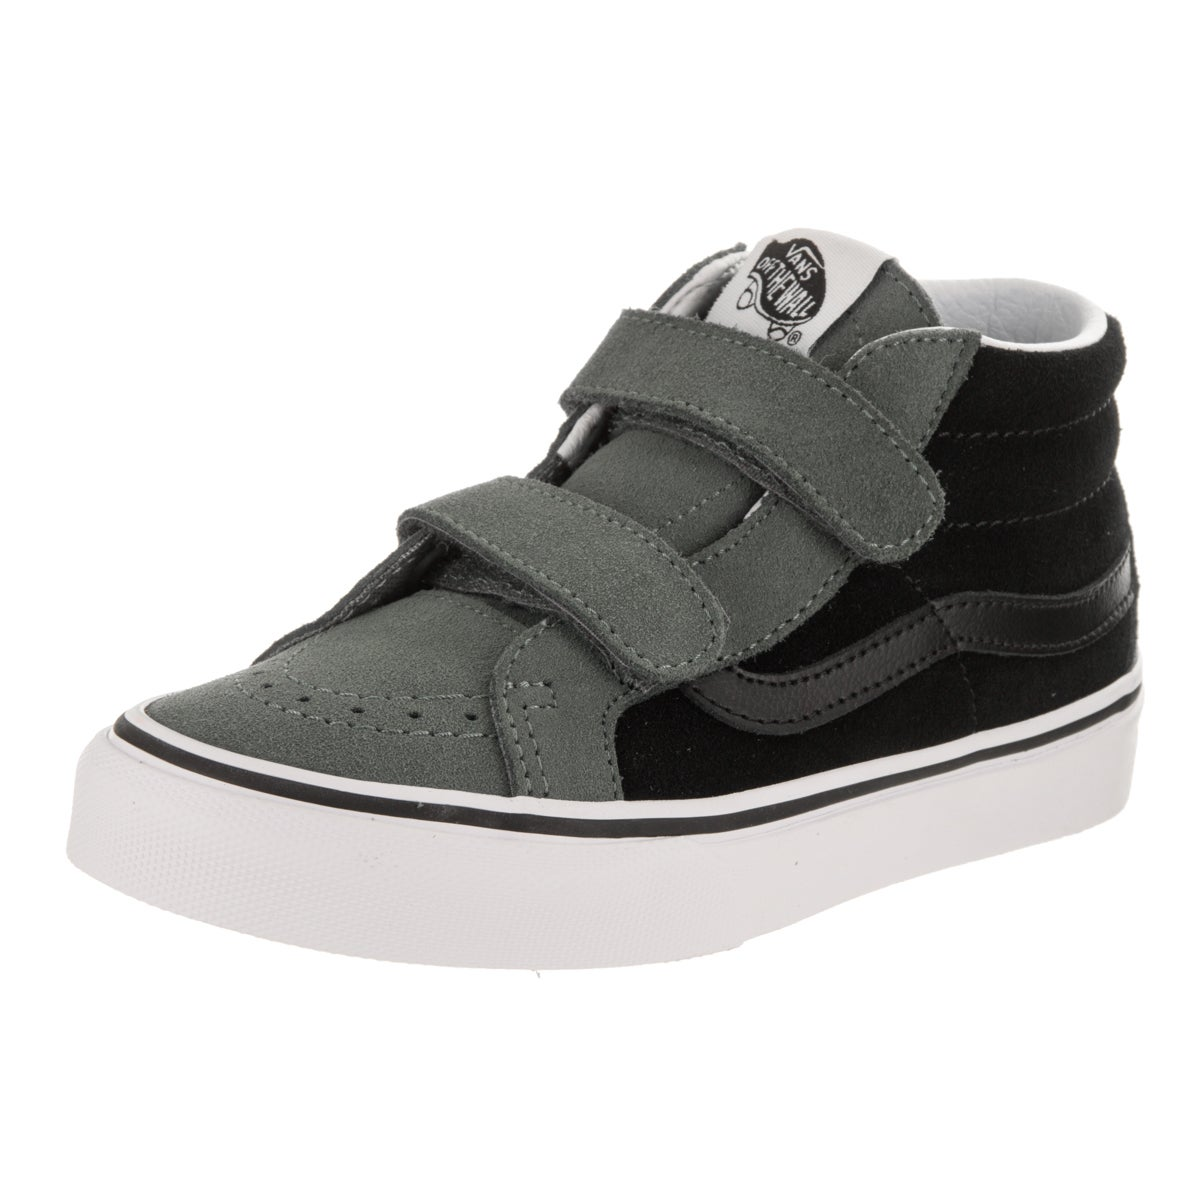 333c7d87c8 Shop Vans Kids Sk8-Mid Reissue V (2-Tone) Skate Shoe - Free Shipping ...